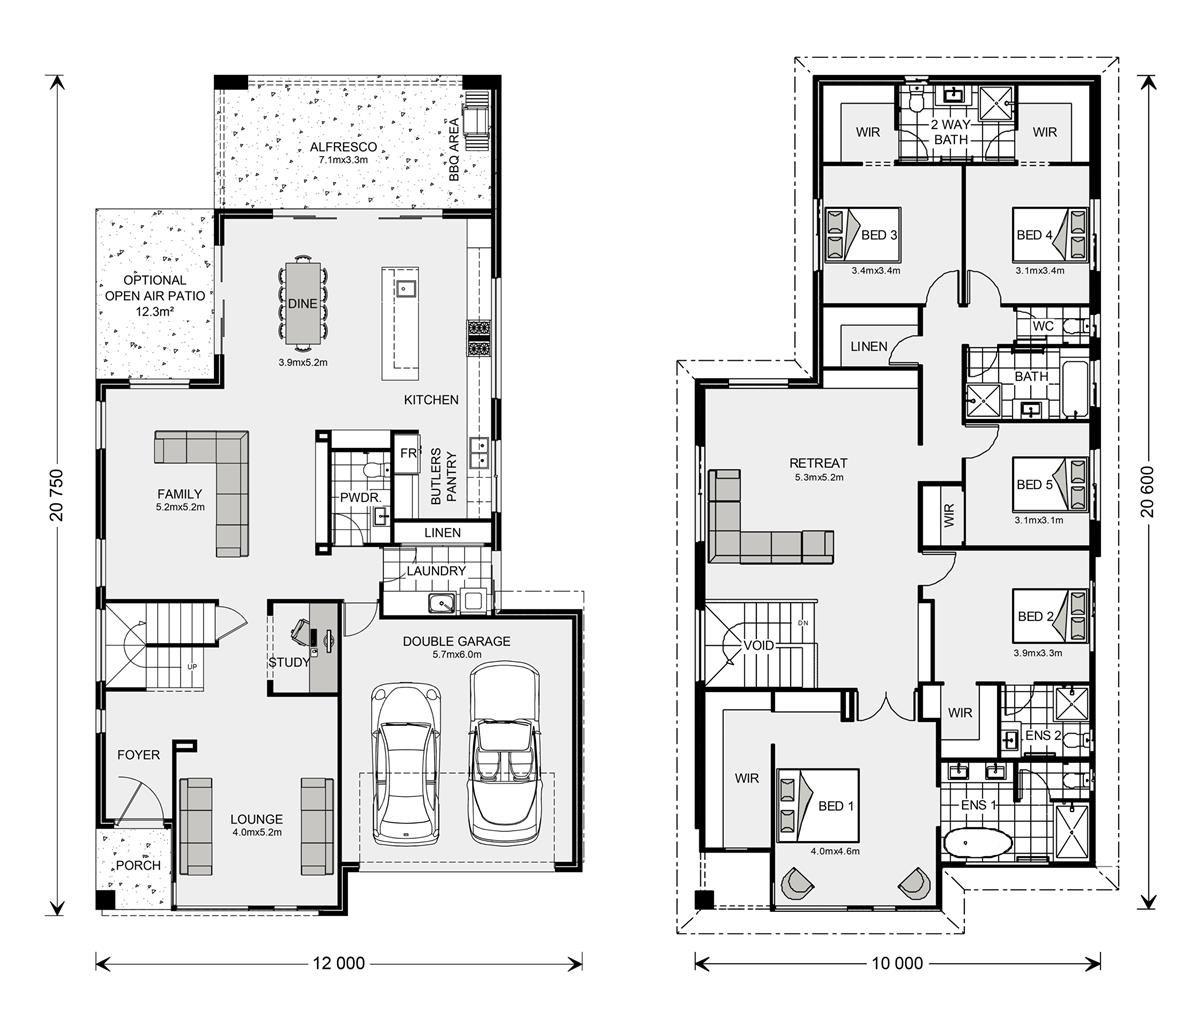 Floor Plan House Plans House Design Floor Plans